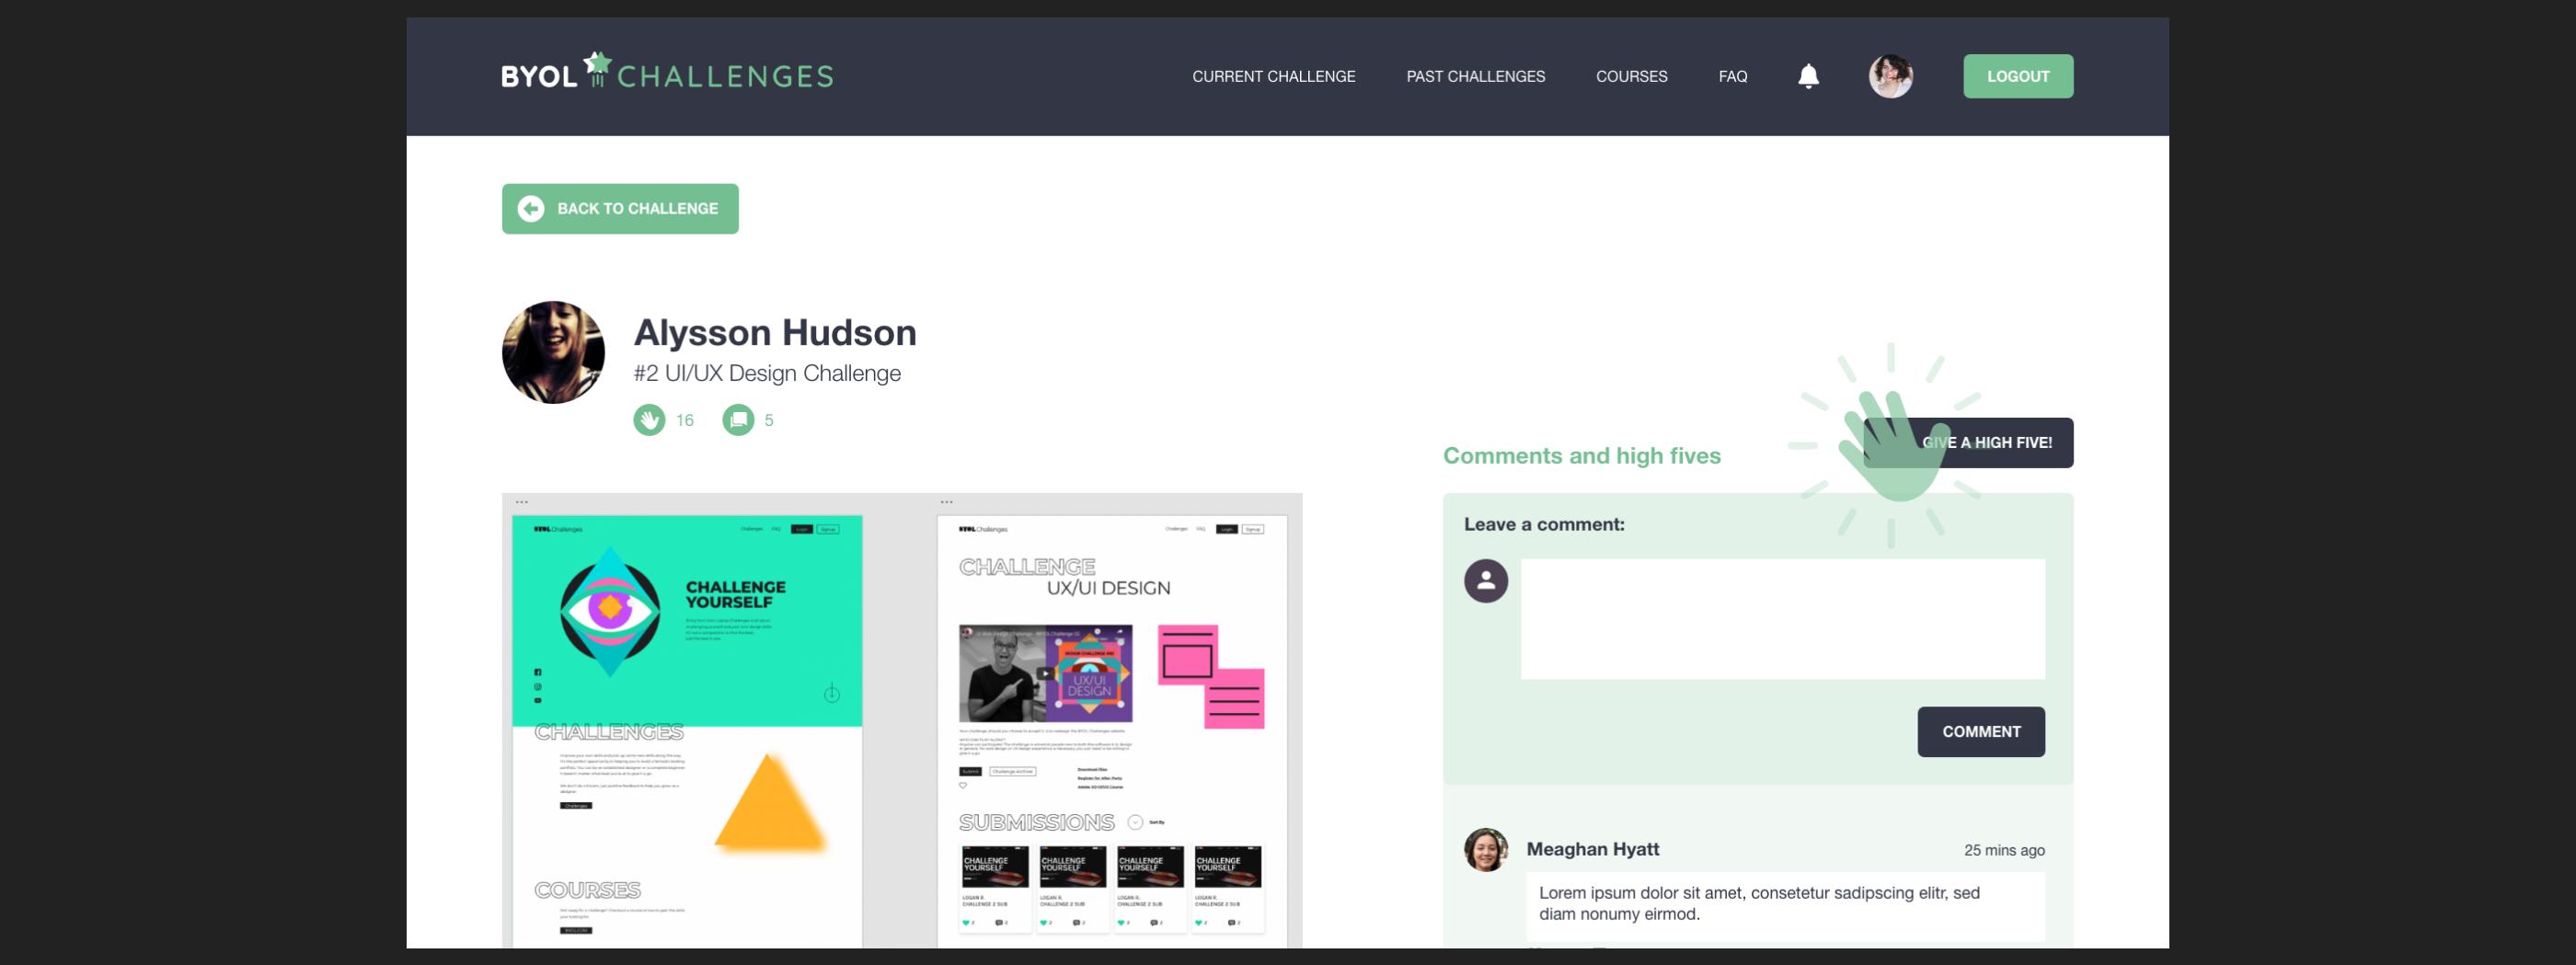 Member page design